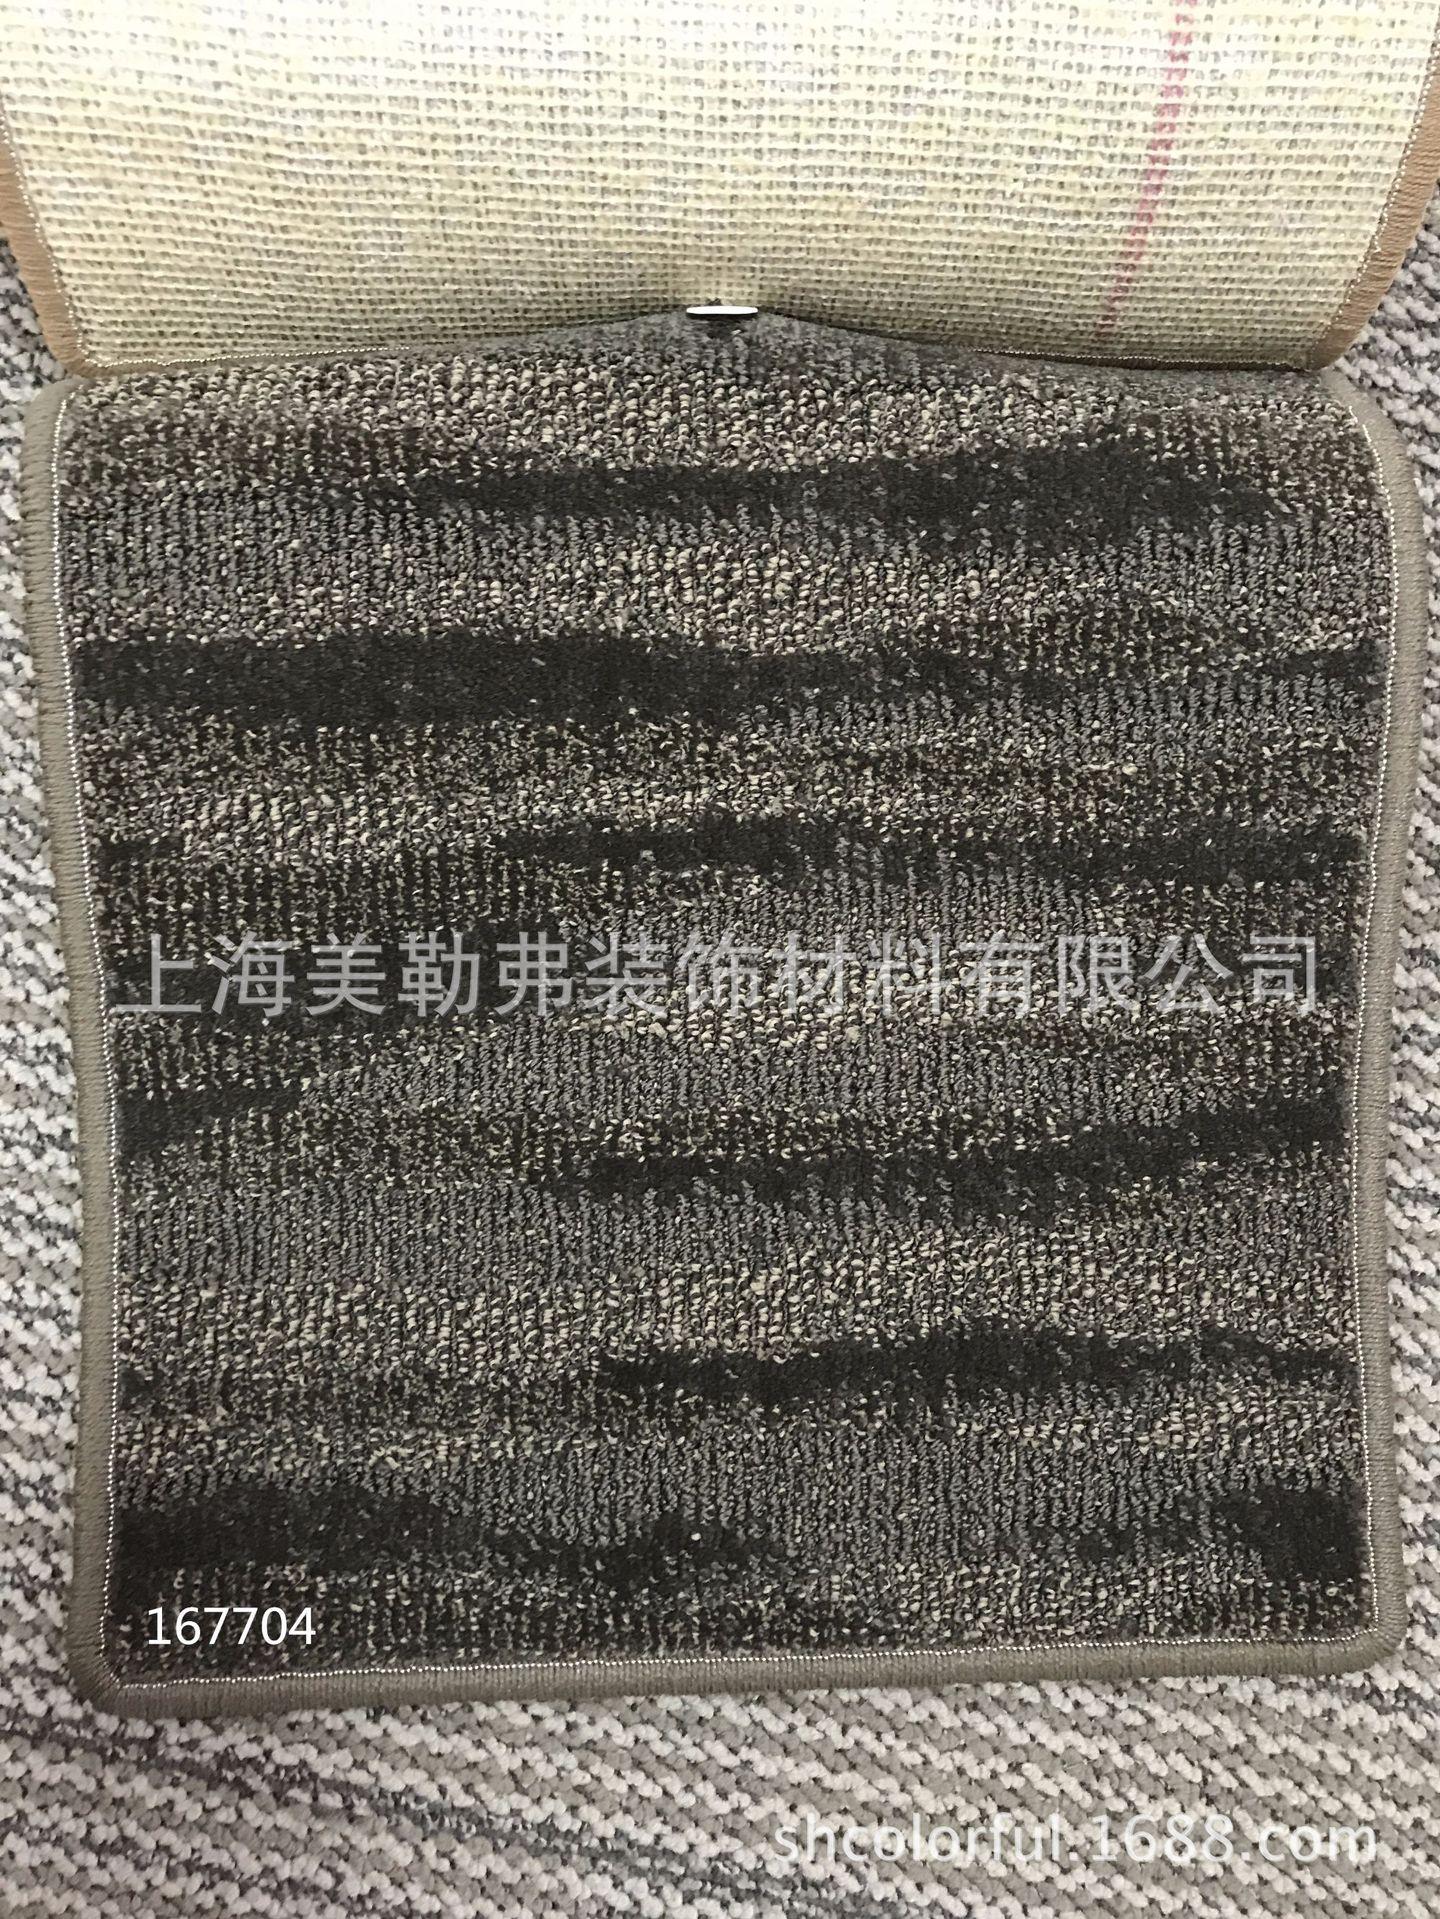 167704-1